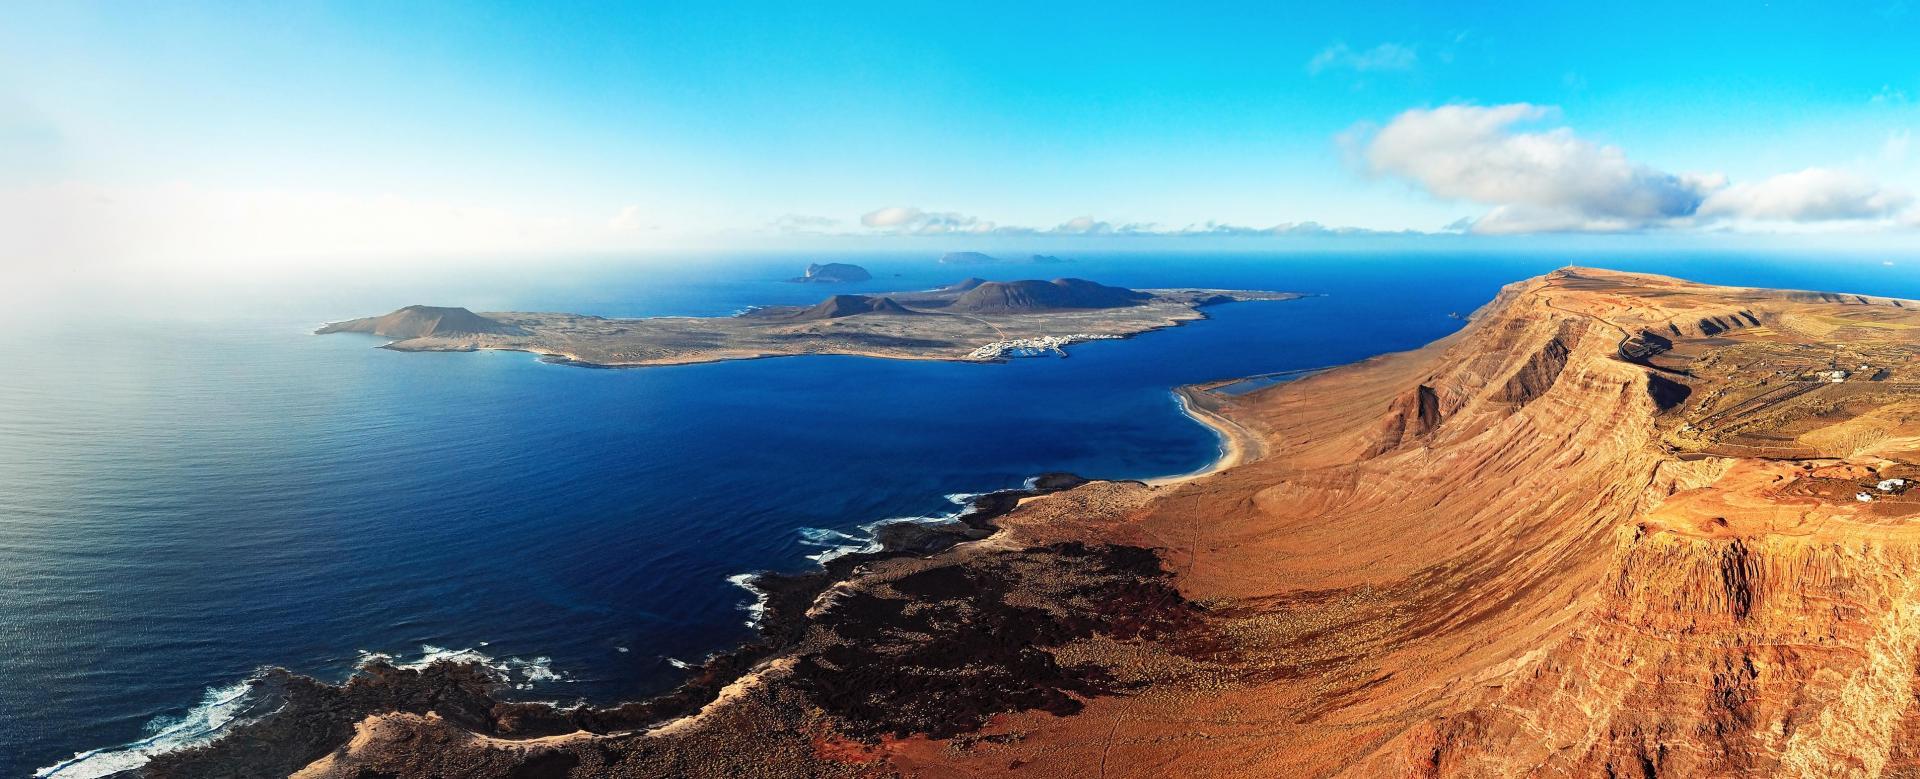 Voyage à pied : Fuerteventura et lanzarote